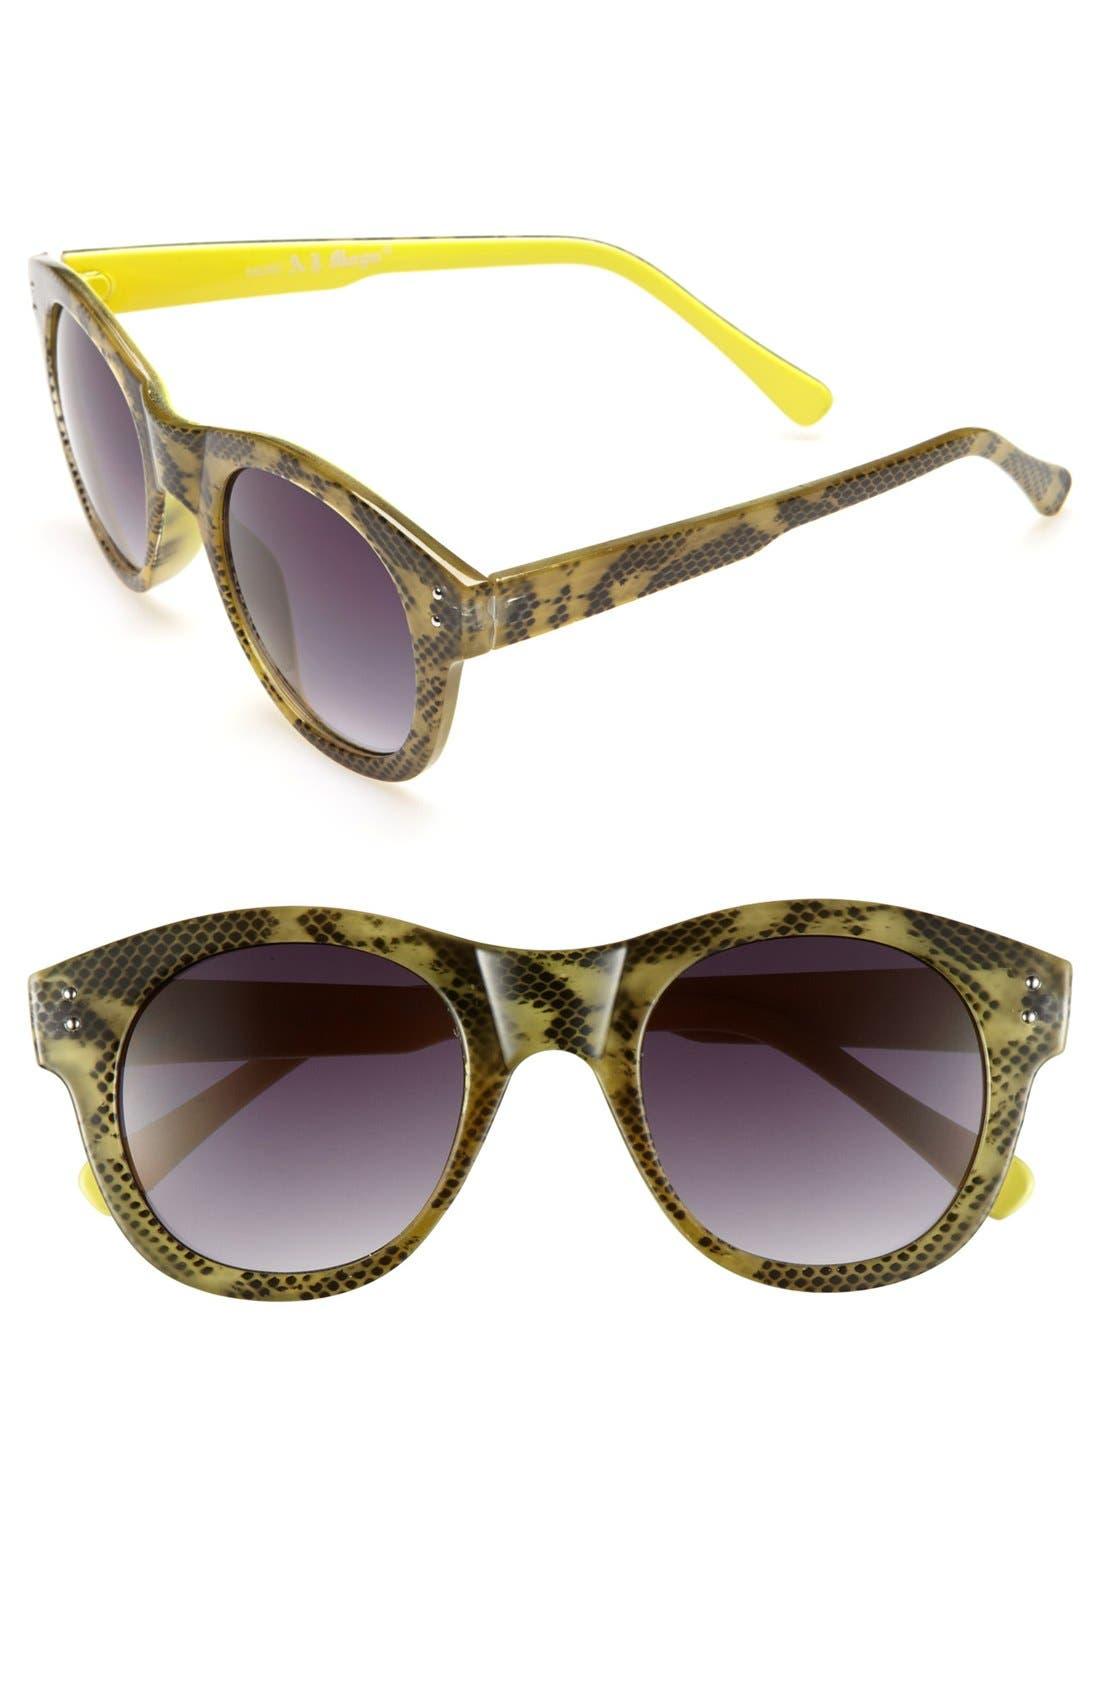 Main Image - A.J. Morgan 'Destiny' Sunglasses